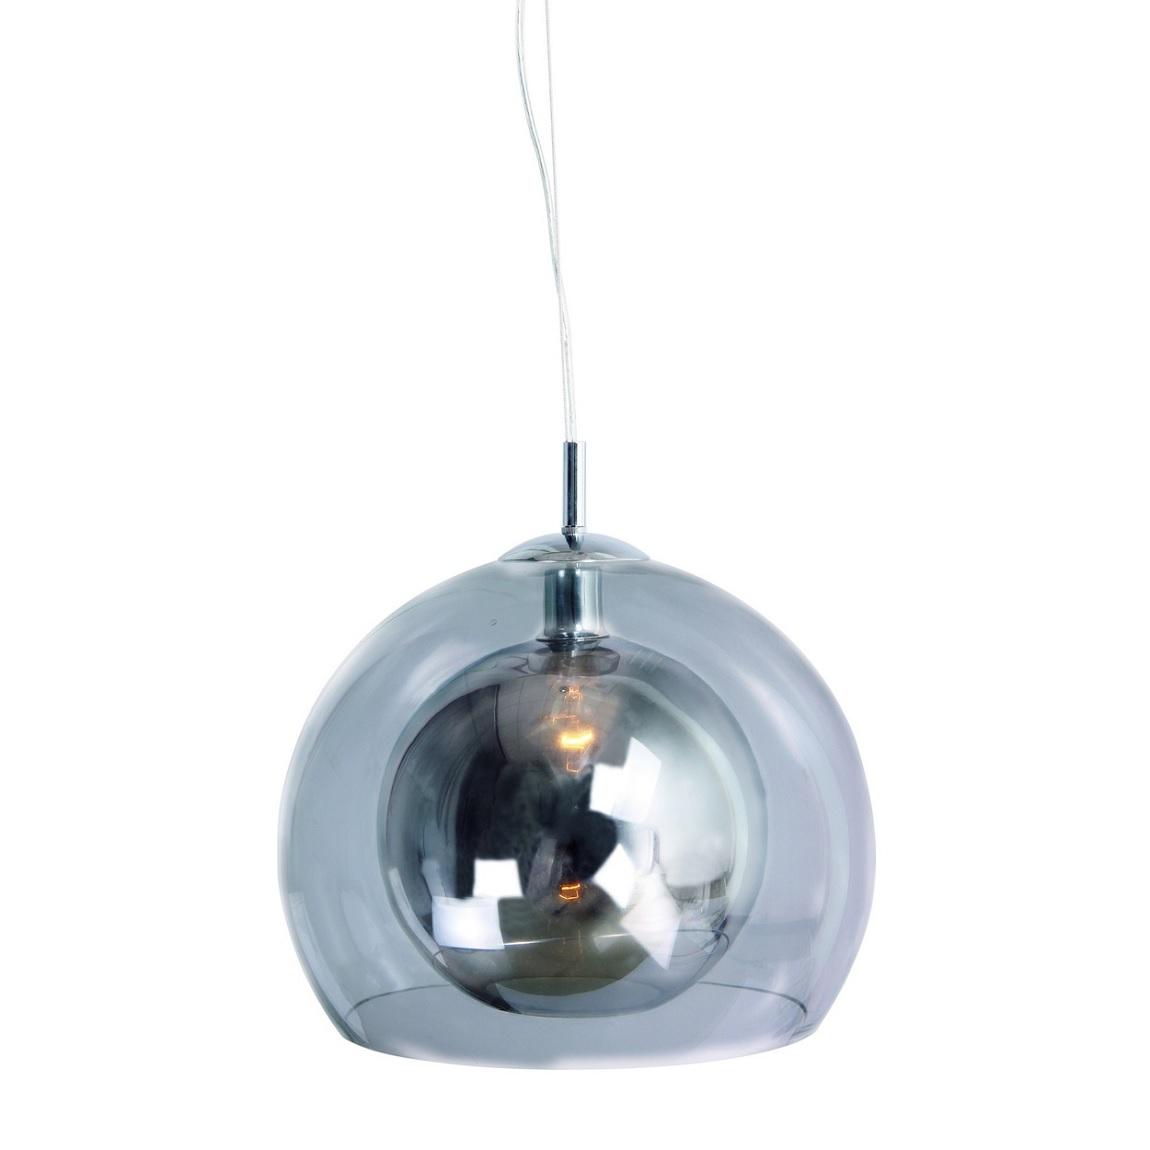 Debenhams home collection juliana pendant ceiling light chandelier sentinel debenhams home collection juliana pendant ceiling light chandelier chrome aloadofball Choice Image